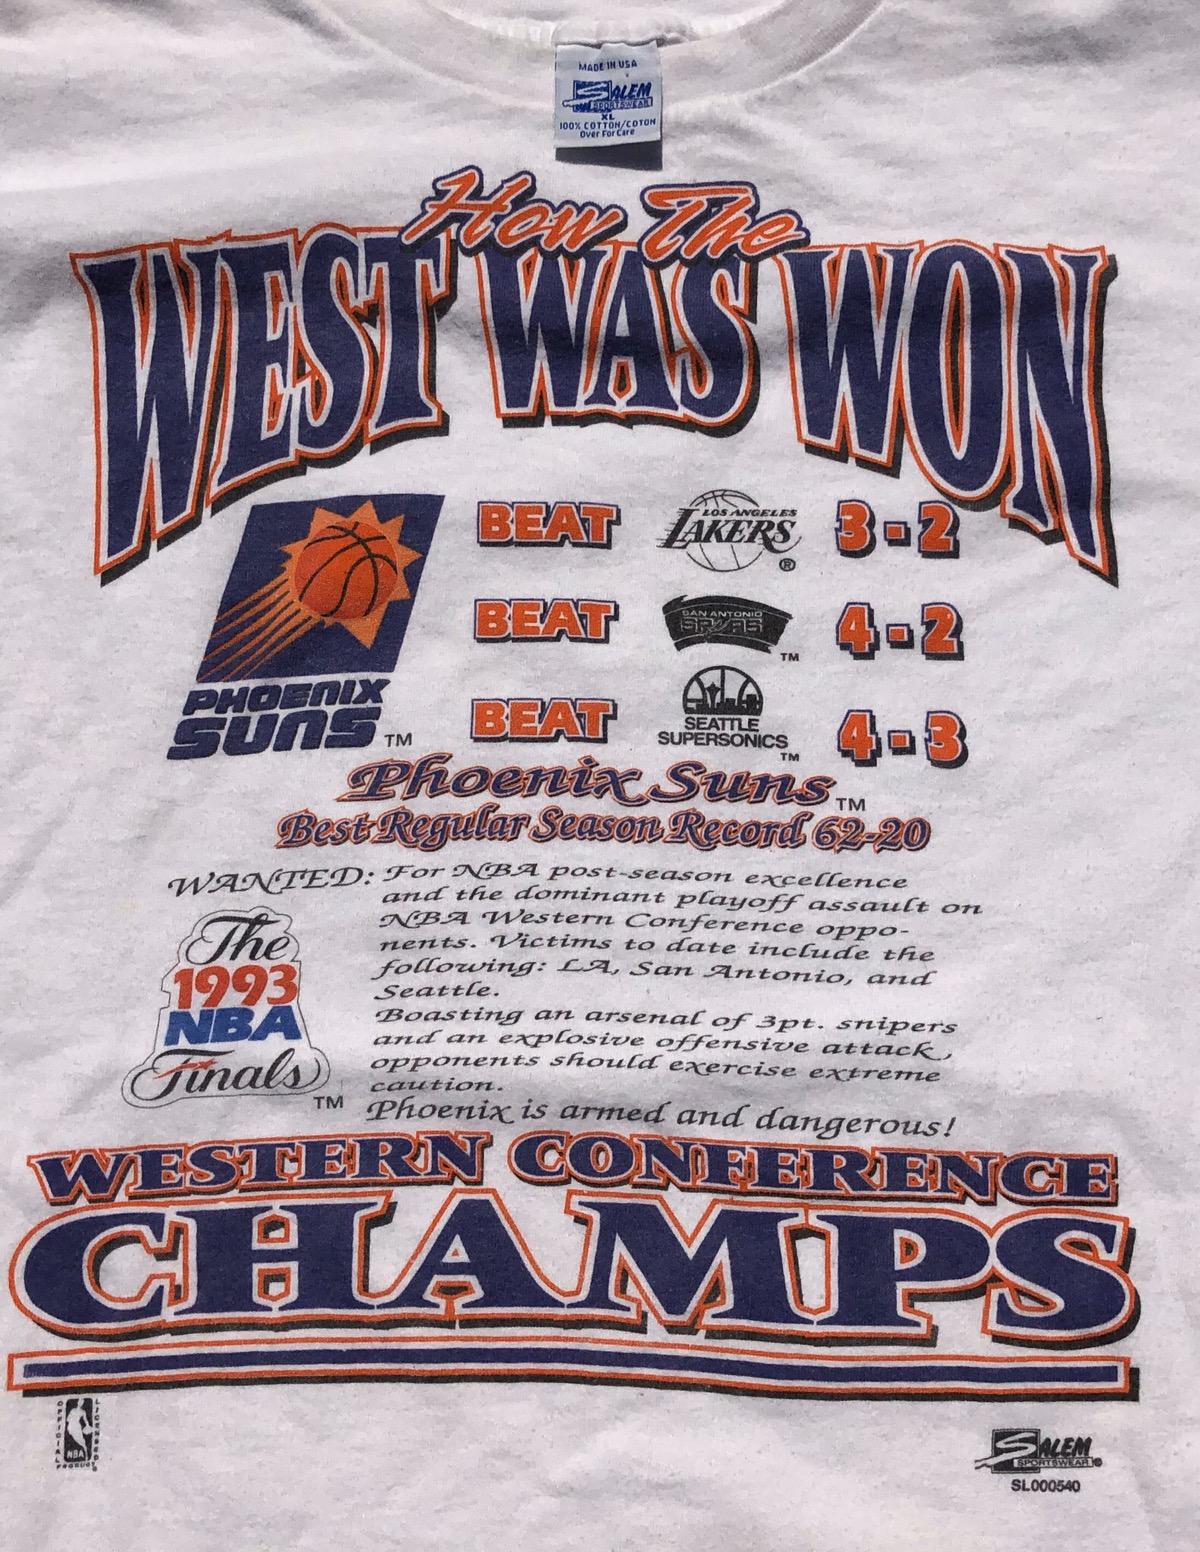 Vintage 1993 Western Conference Champs Phoenix Suns tank size large